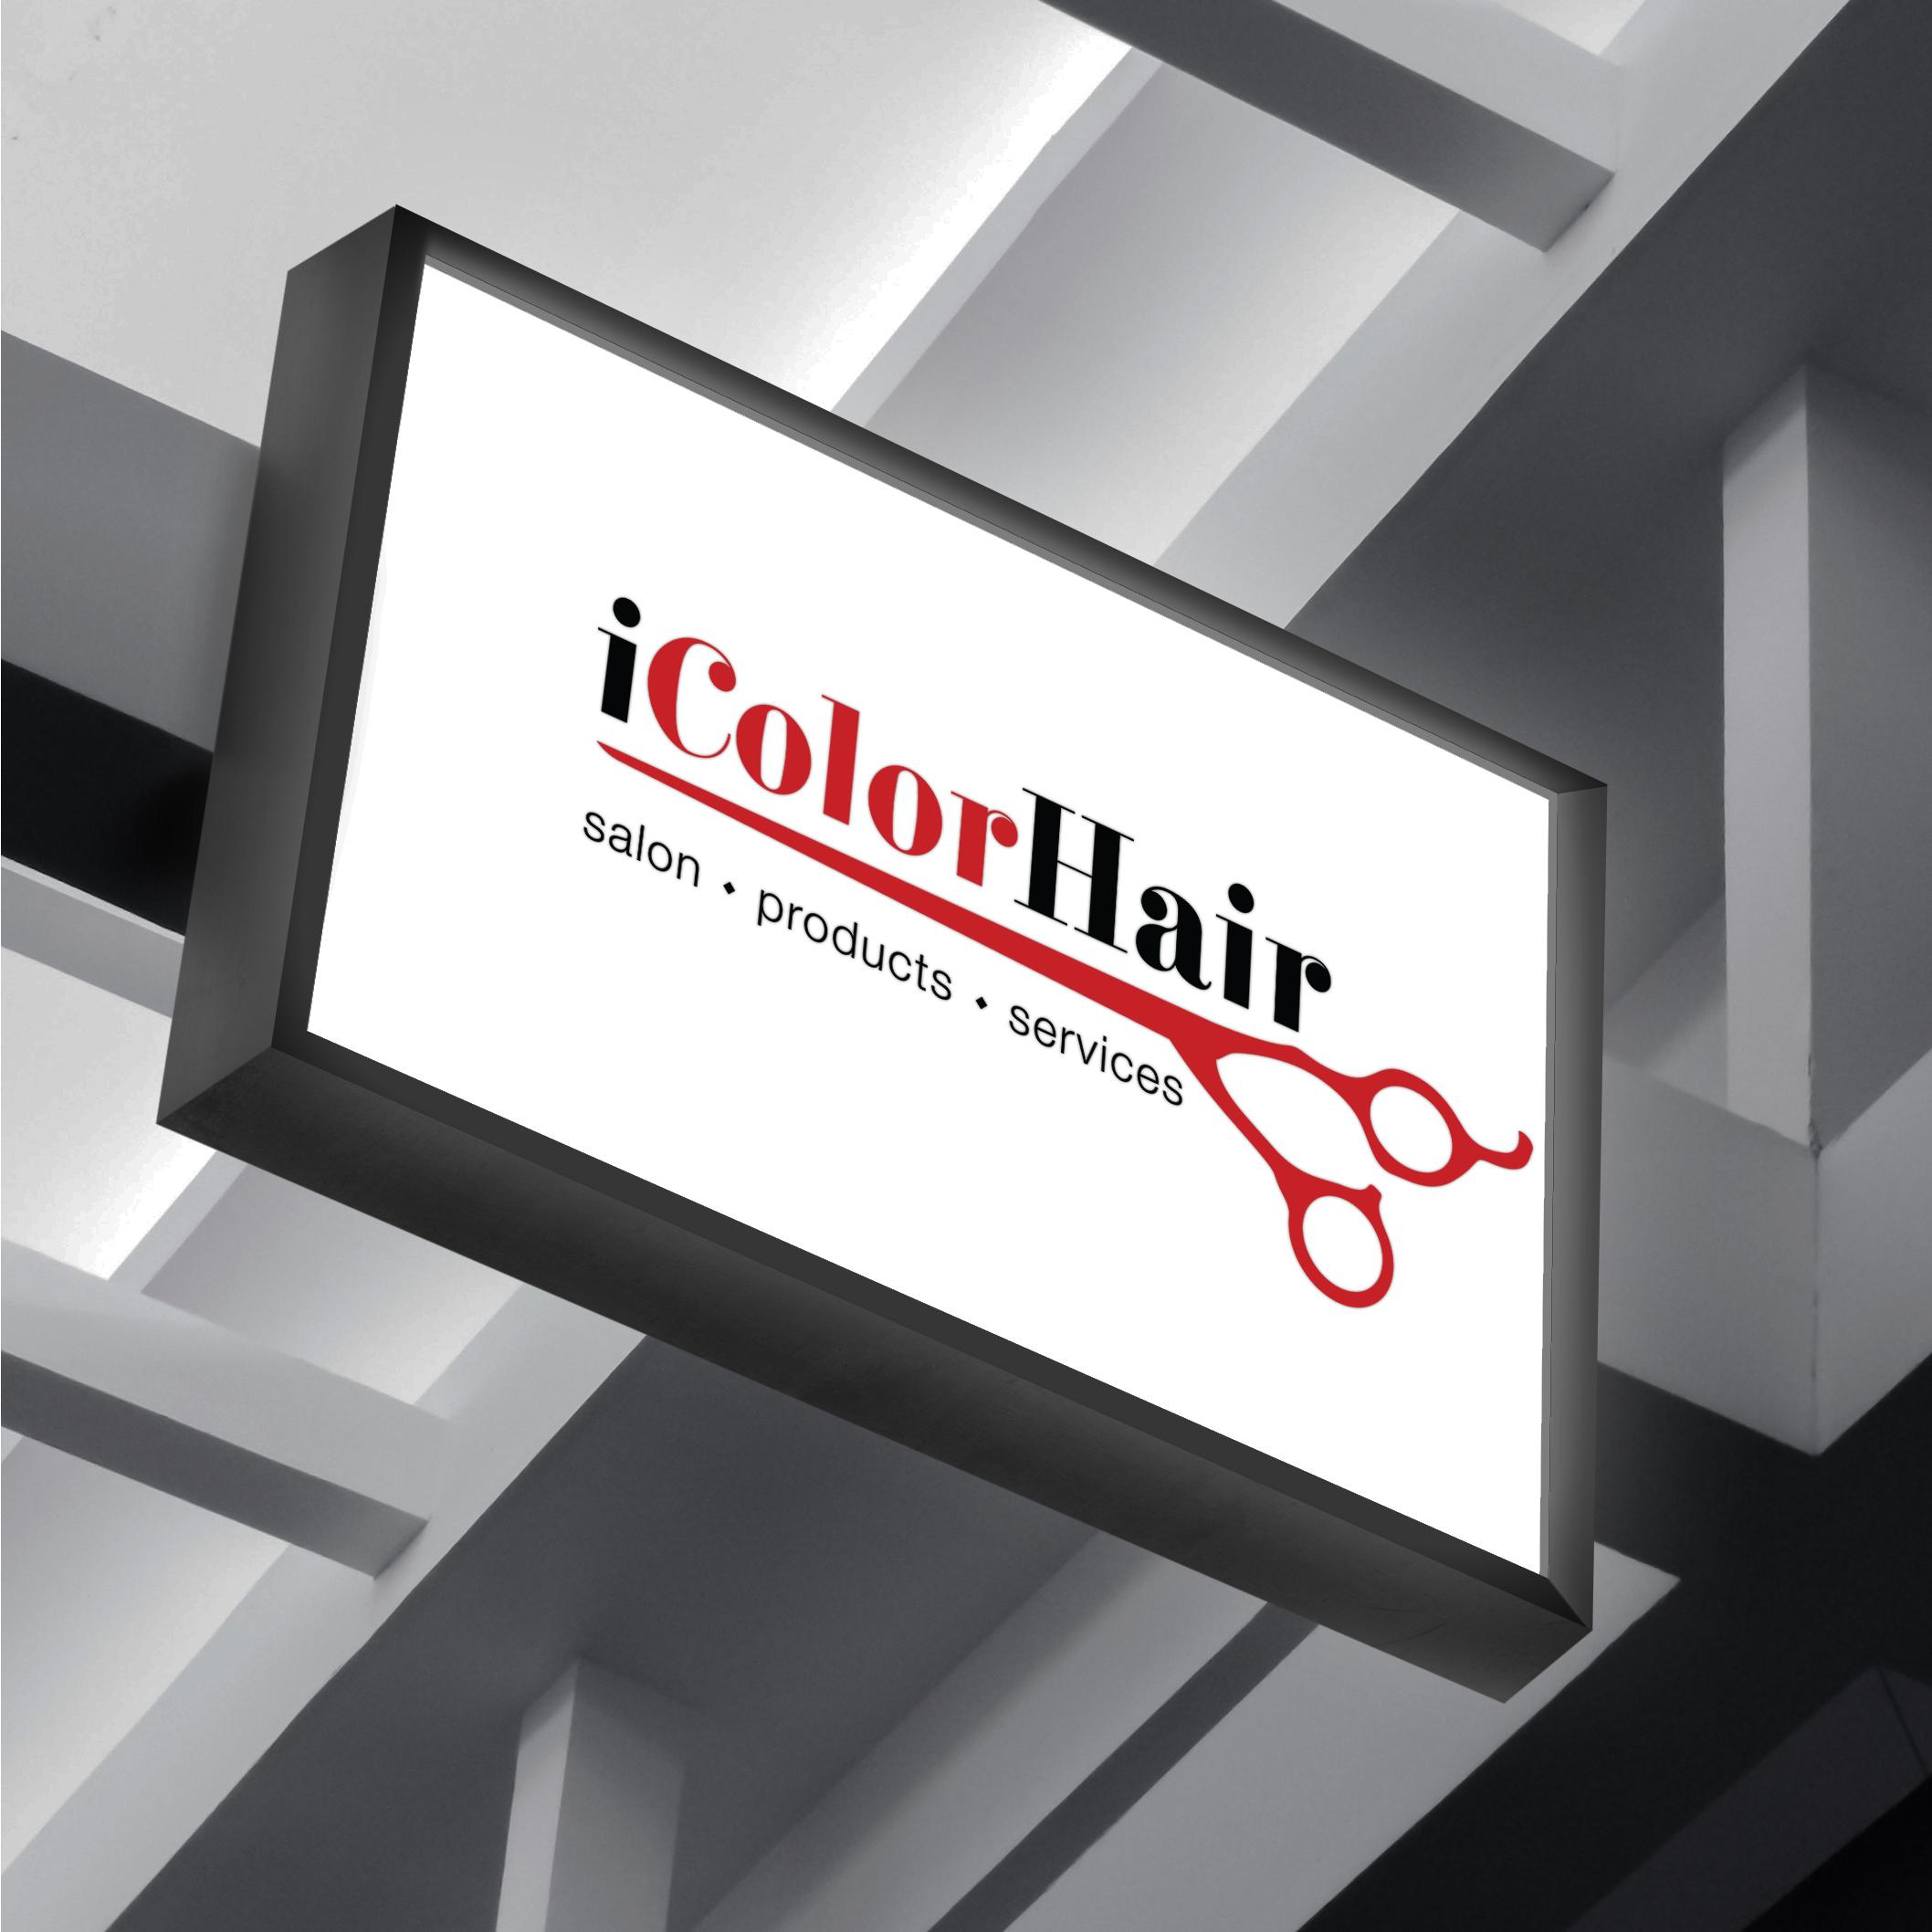 iColorHair - Los Angeles based beauty salon.